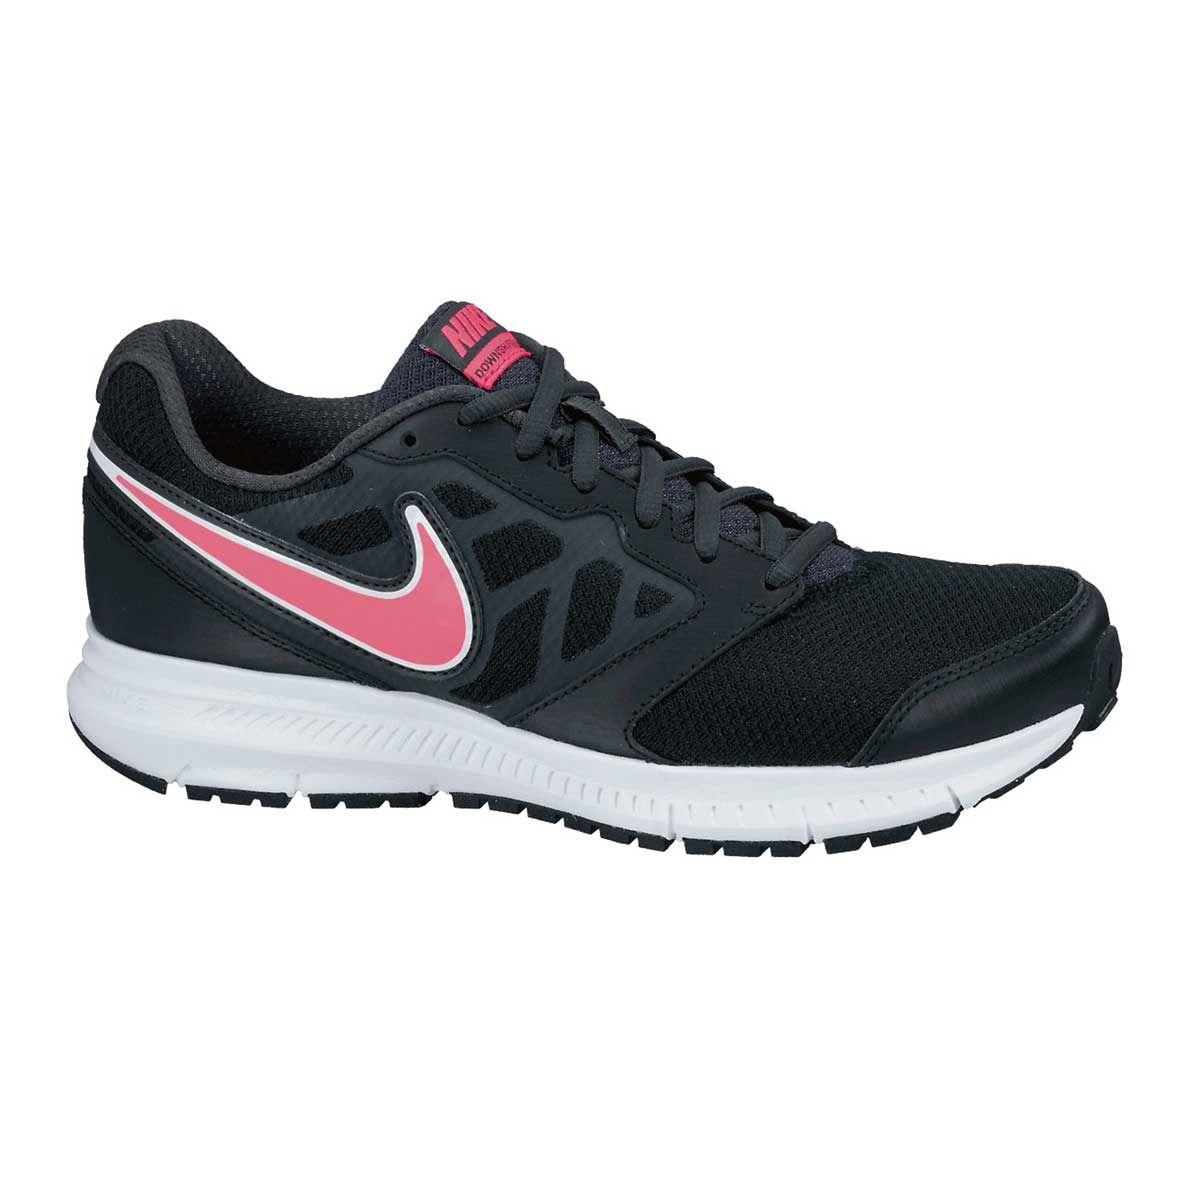 quality design 03b67 68e06 Nike Downshifter 6 Women s Running Shoes - Amart Sports